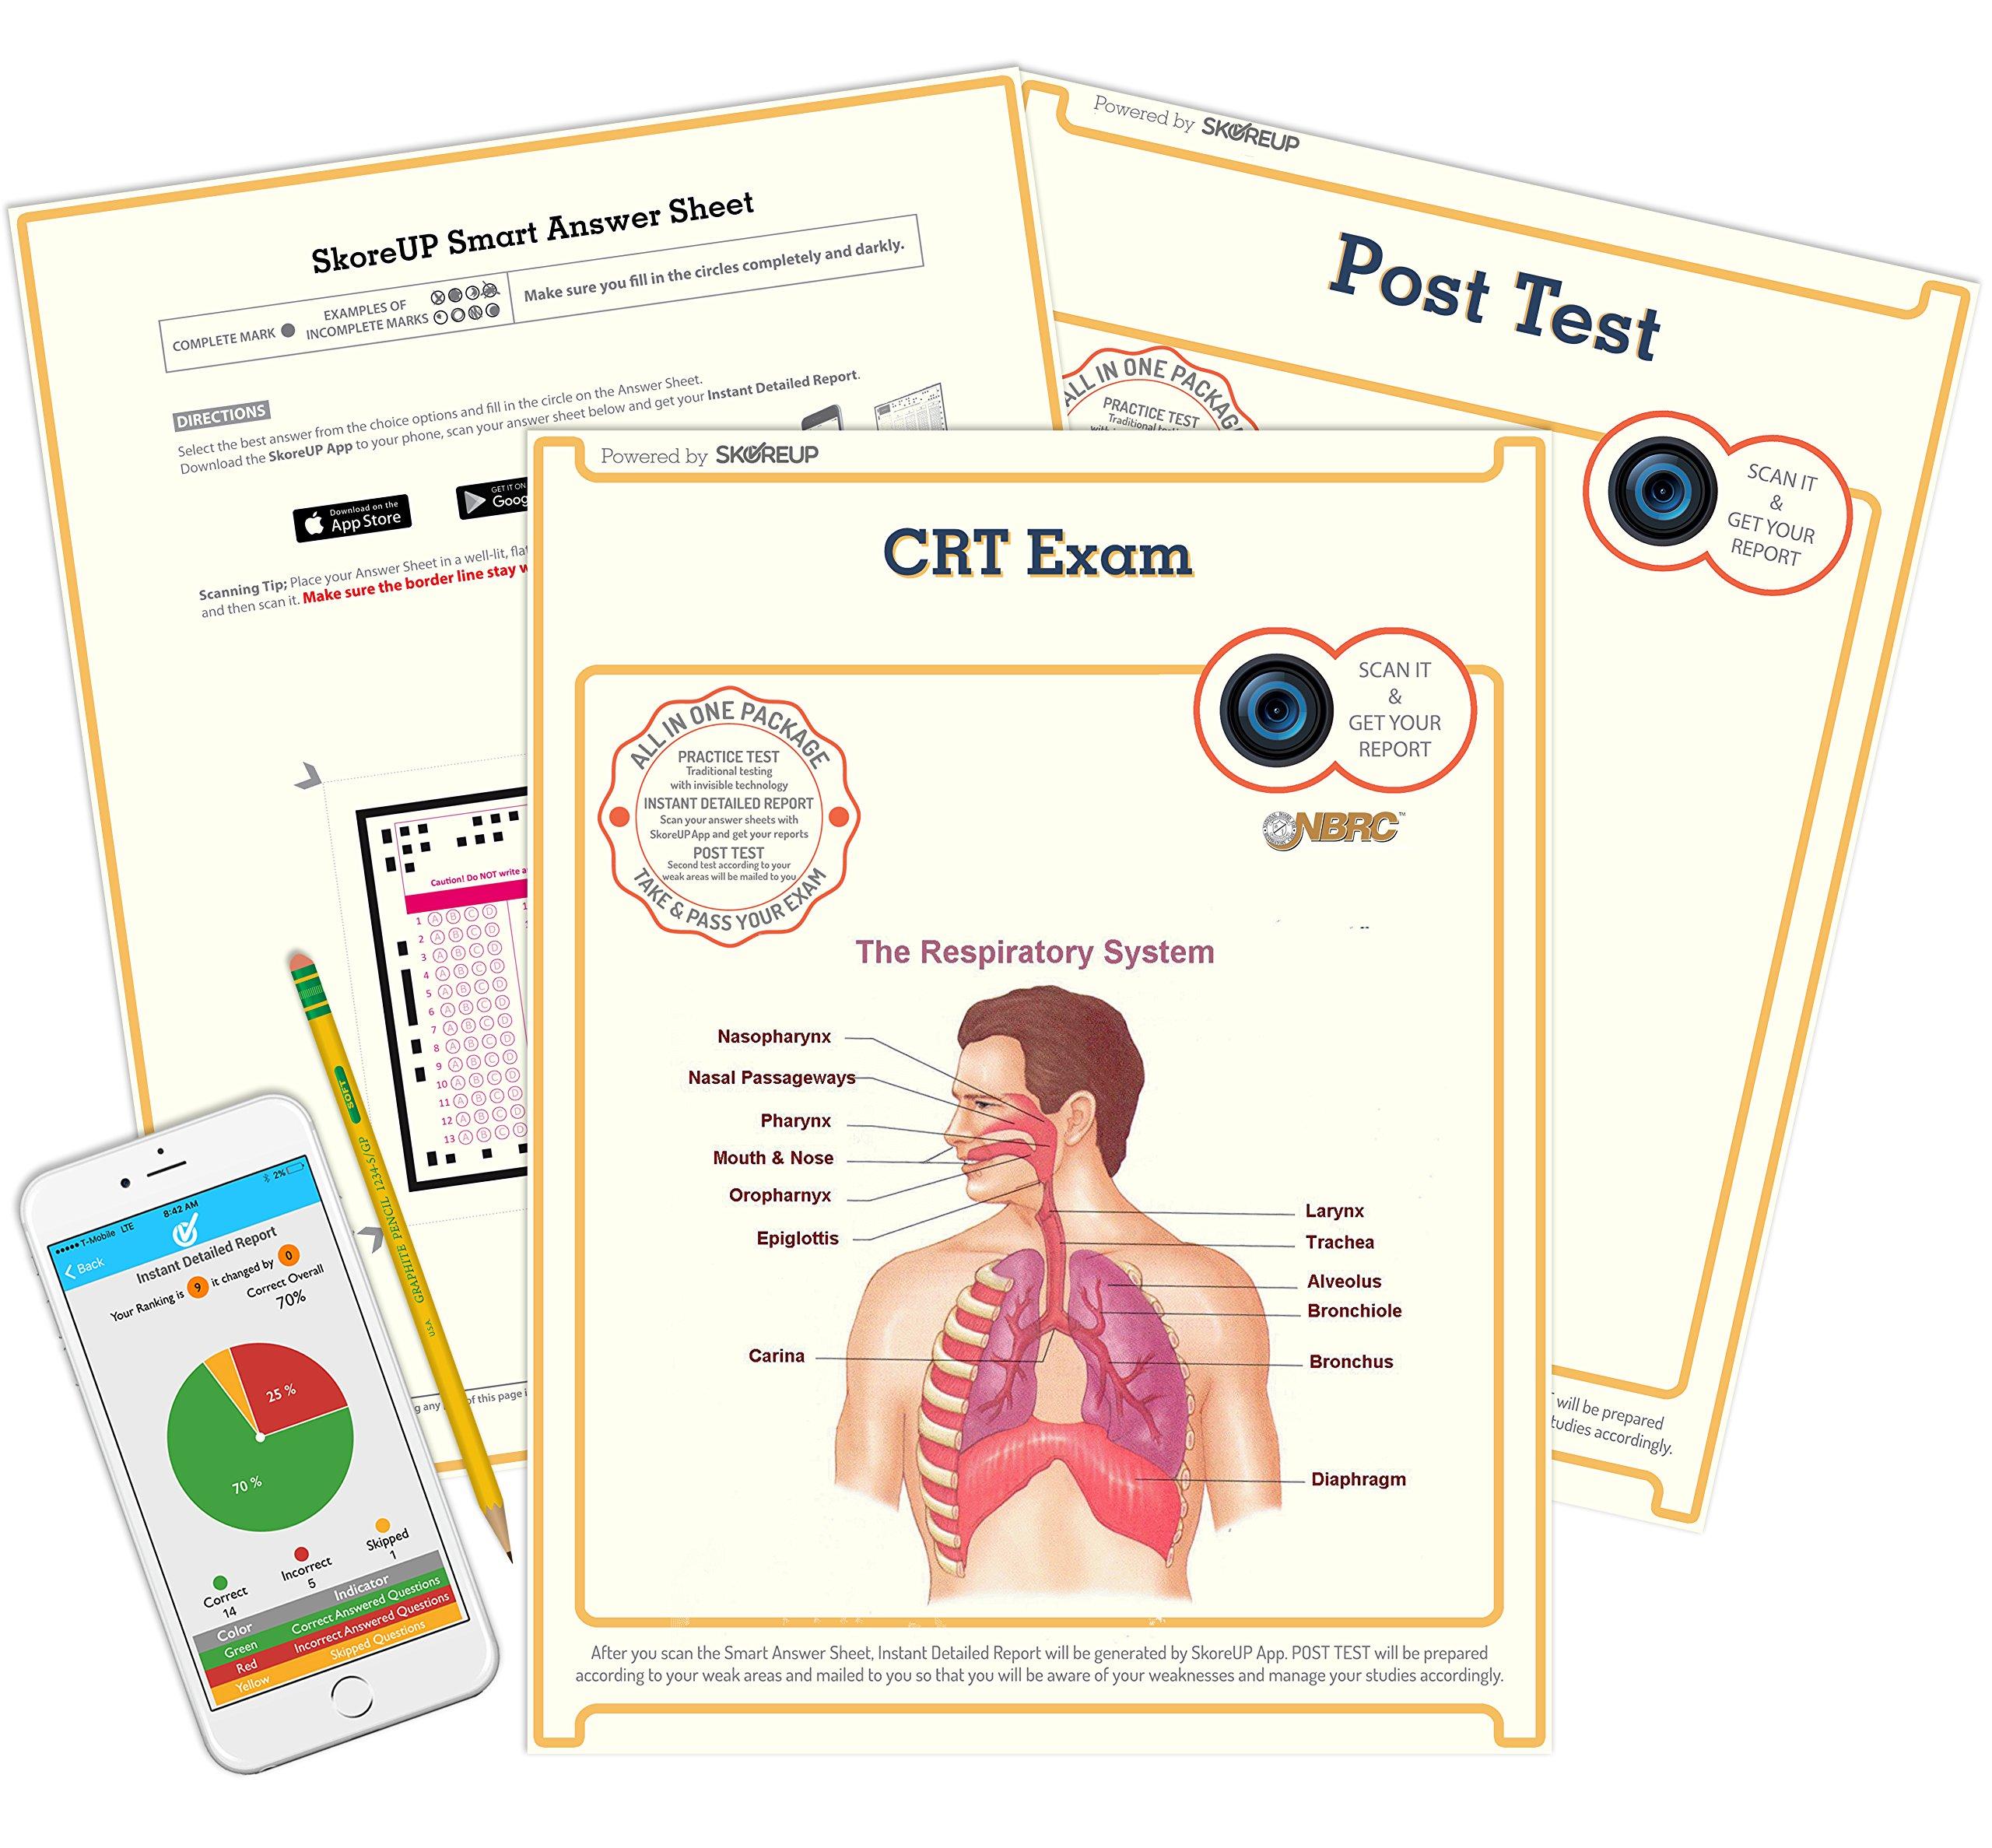 Certified Respiratory Therapist Exam Crt Test Prep Study Guide